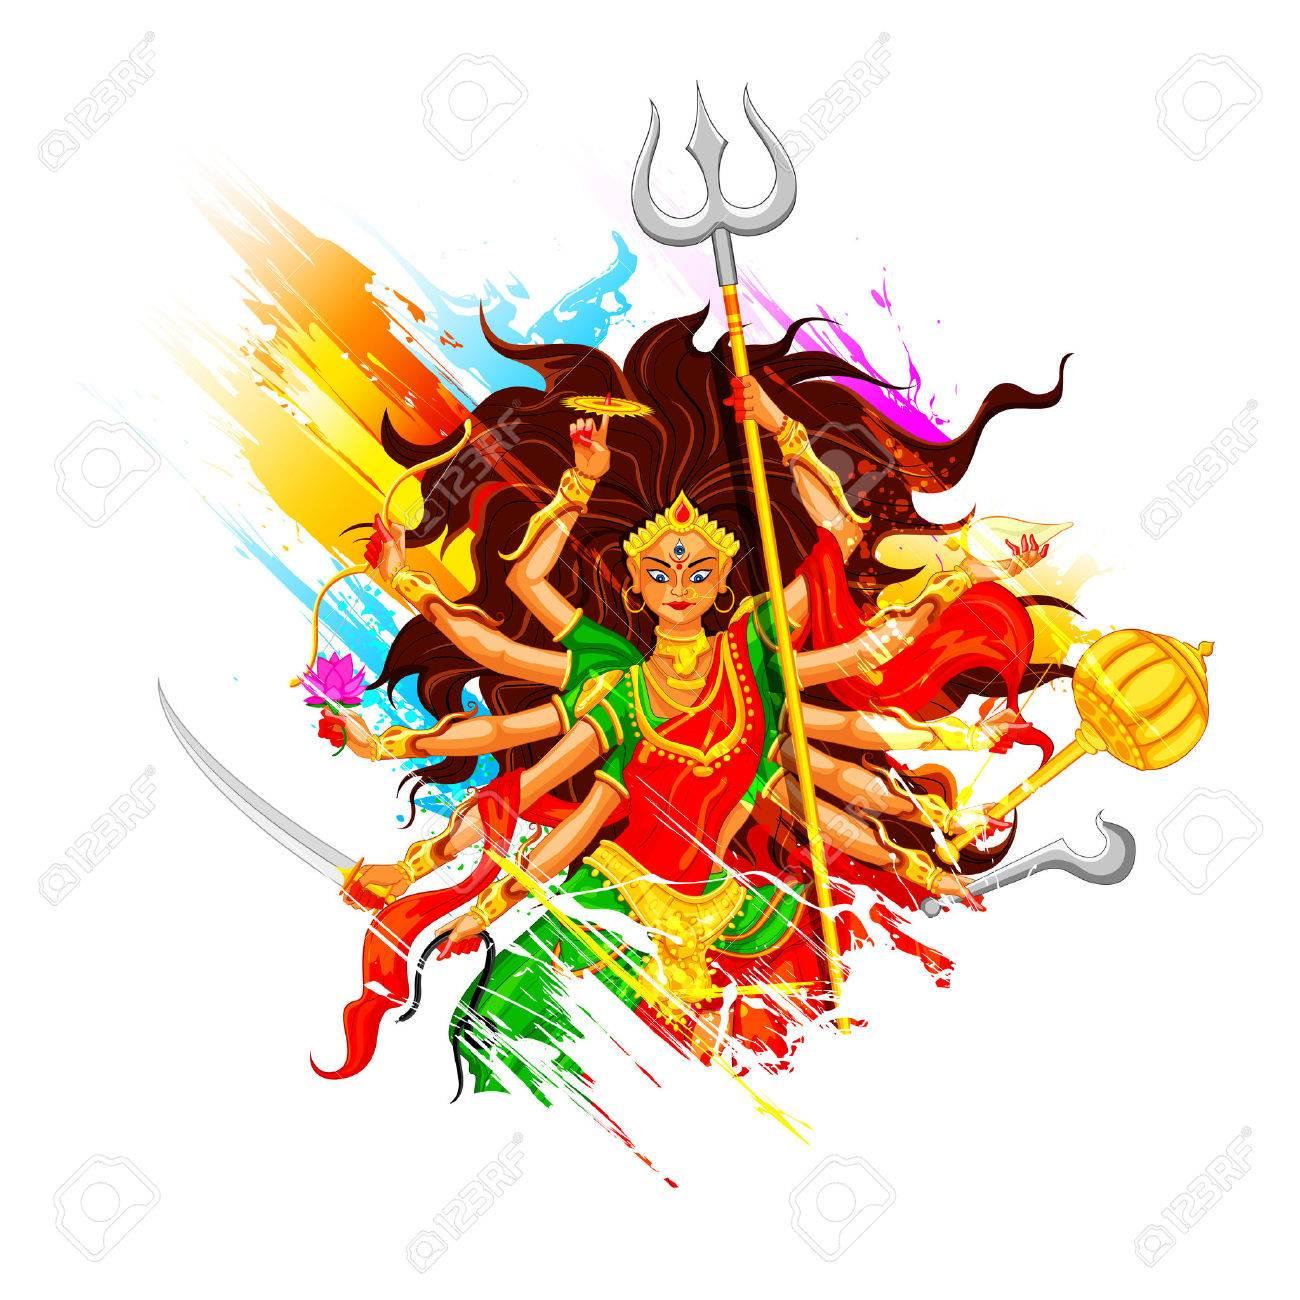 illustration of goddess Durga in Subho Bijoya (Happy Dussehra) background  Stock Vector - 25737204